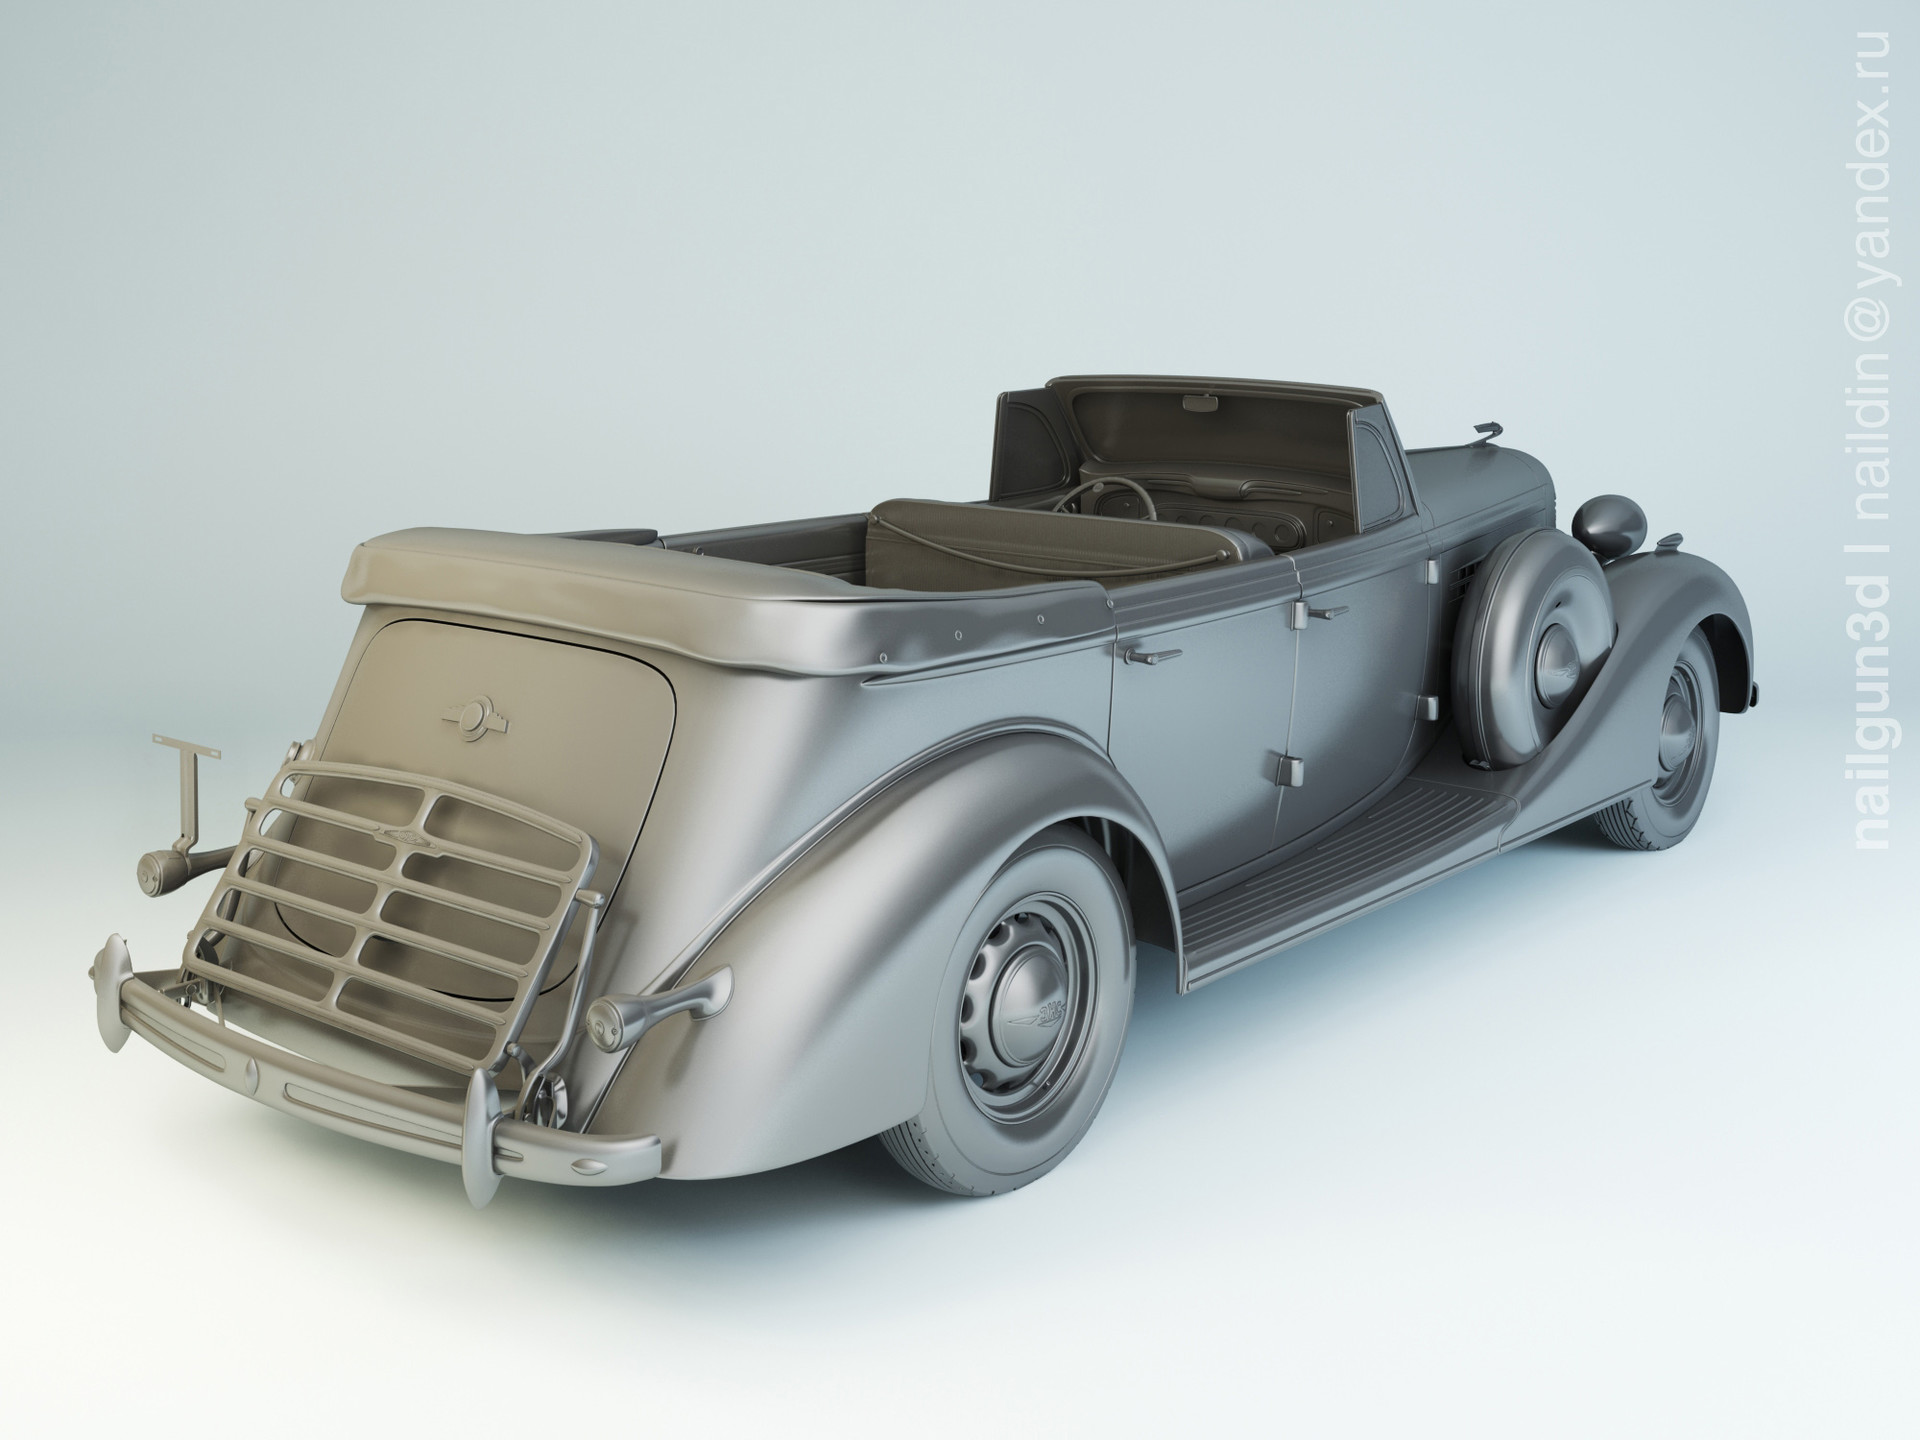 Nail khusnutdinov als 210 014 zis 102a 1939 modelling 1